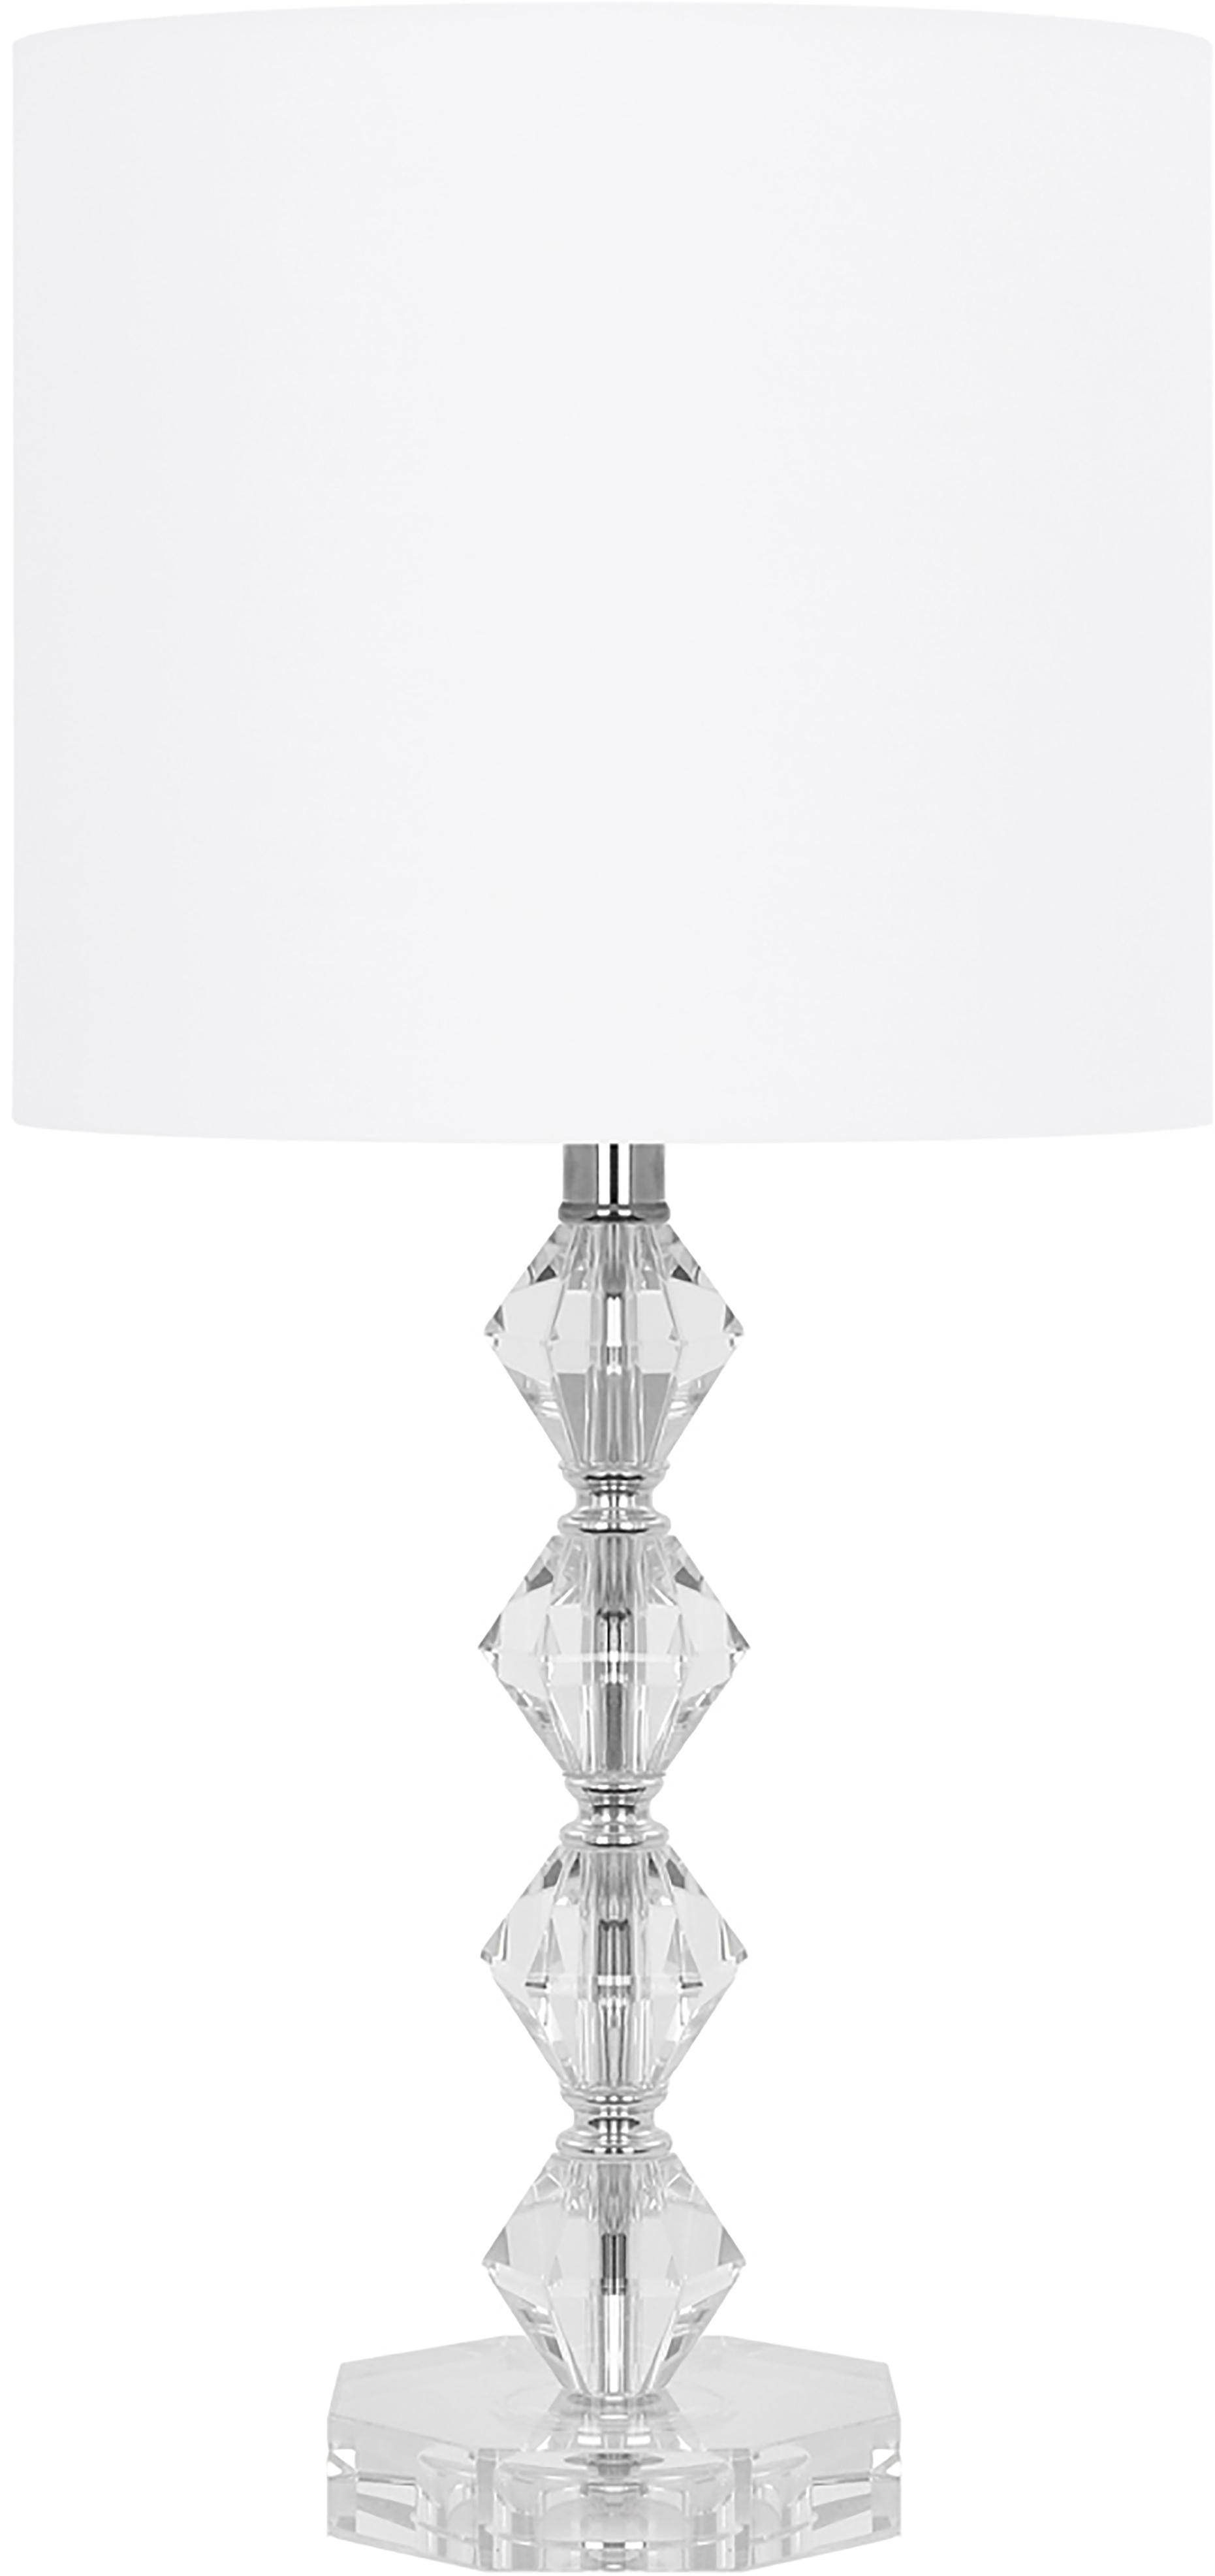 Tischlampe Diamond aus Kristallglas, Lampenschirm: Textil, Lampenschirm: Weiss, Lampenfuss: Transparent, Kabel: Weiss, Ø 25 x H 53 cm